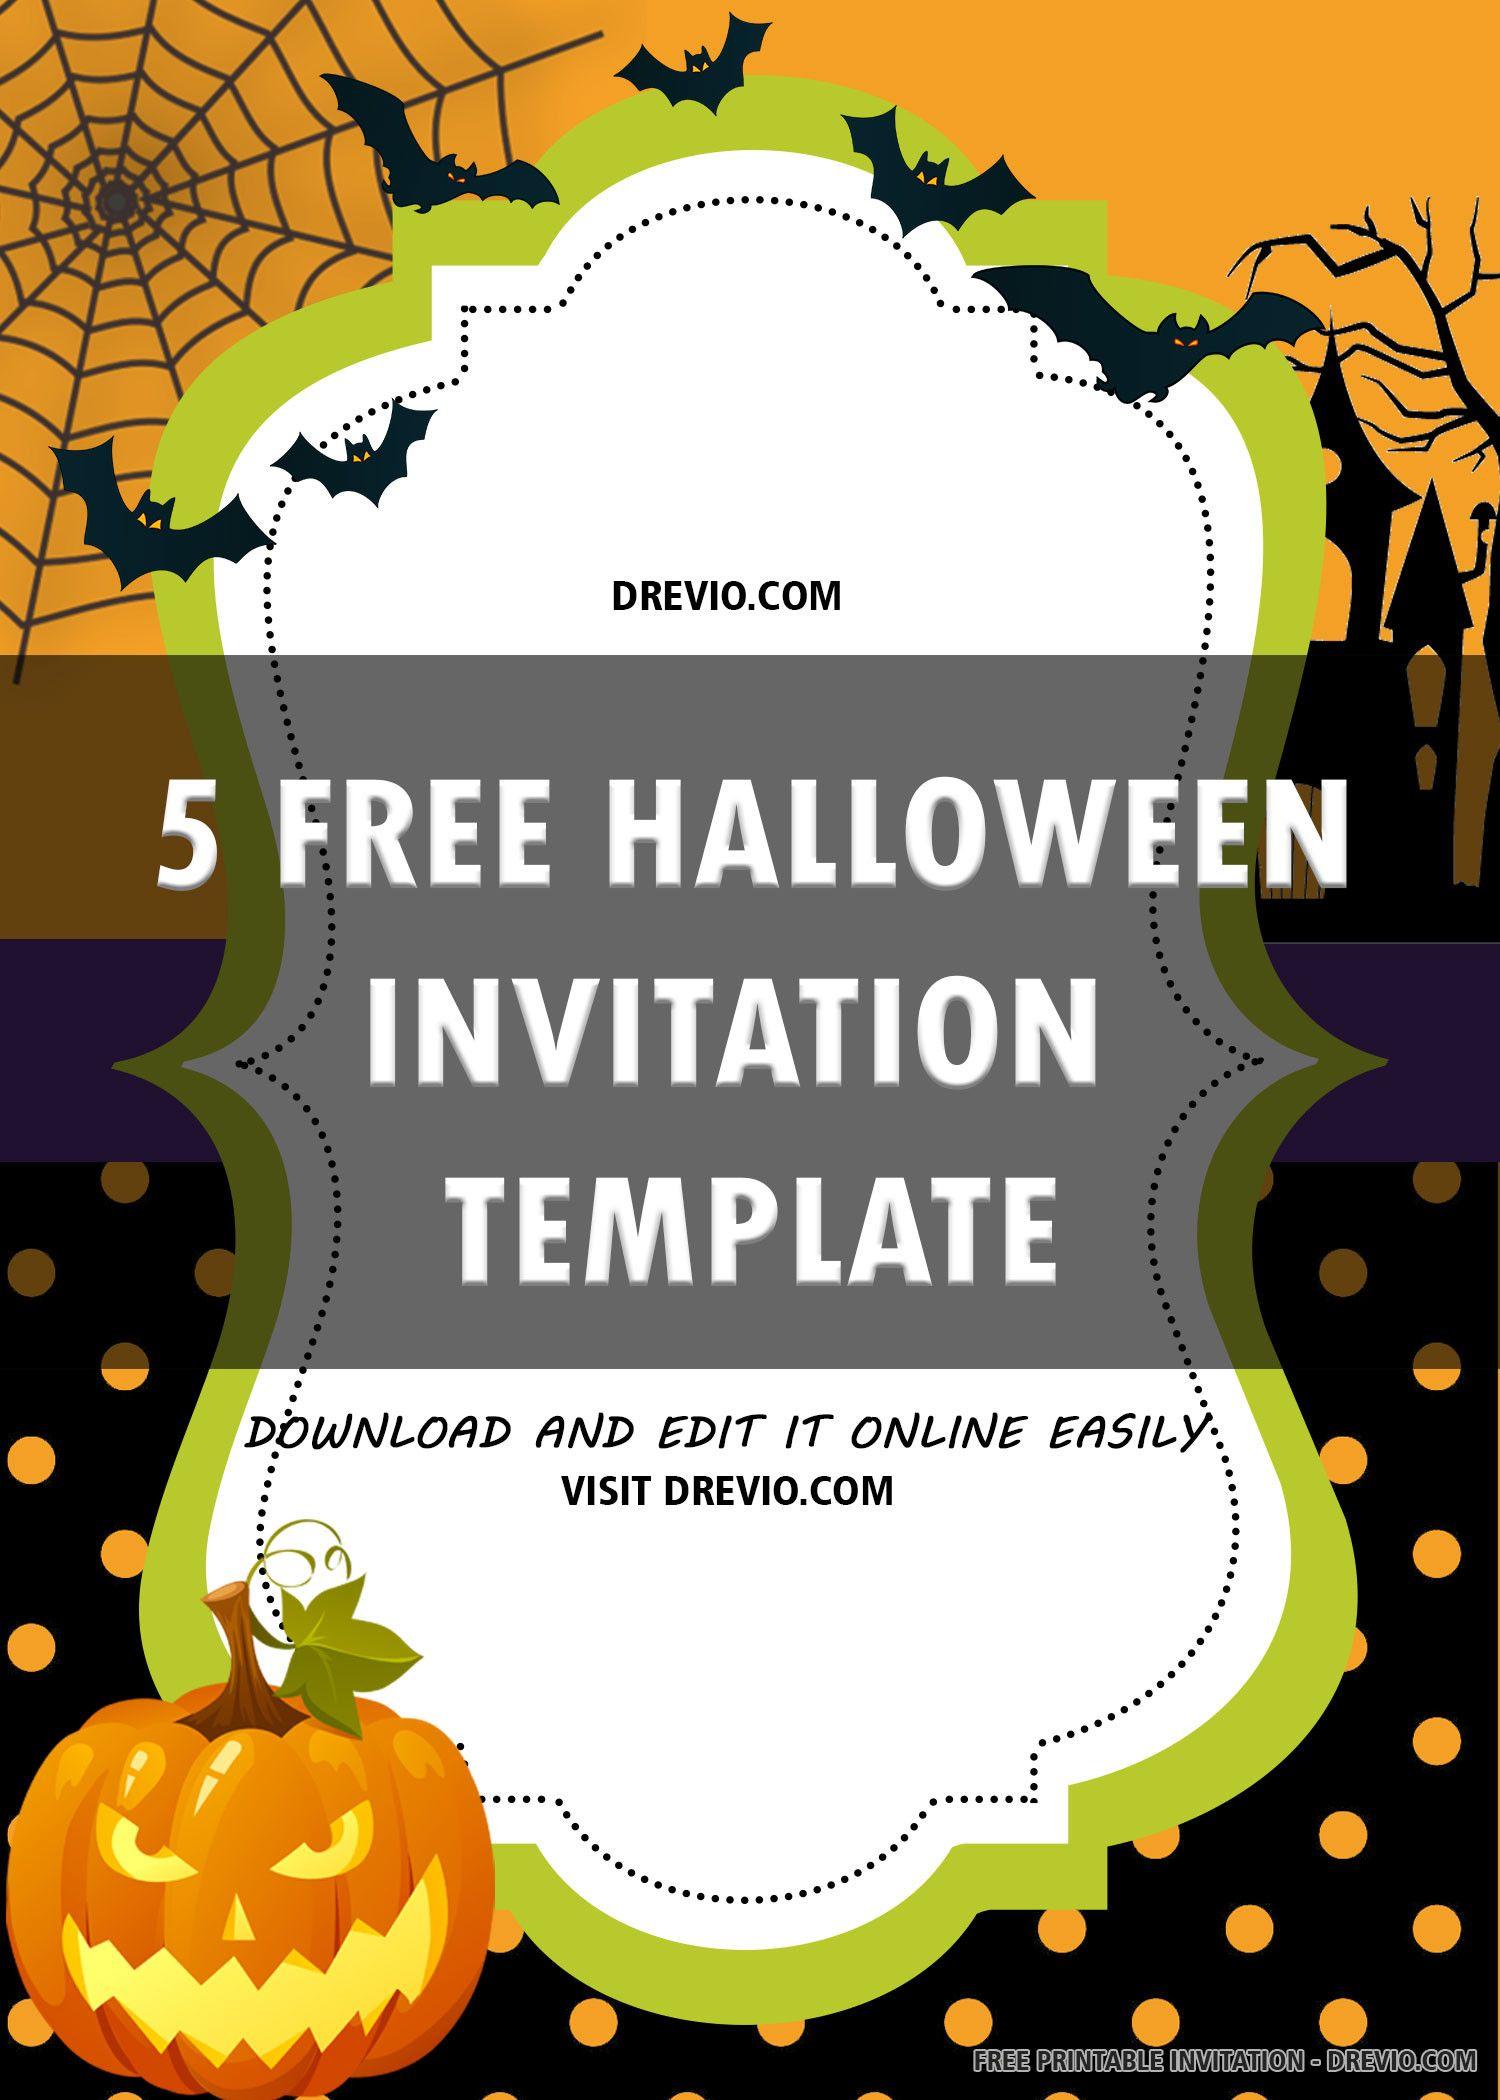 Free Halloween Invitation Template In 2020 Free Halloween Invitations Free Halloween Invitation Templates Halloween Invitation Template